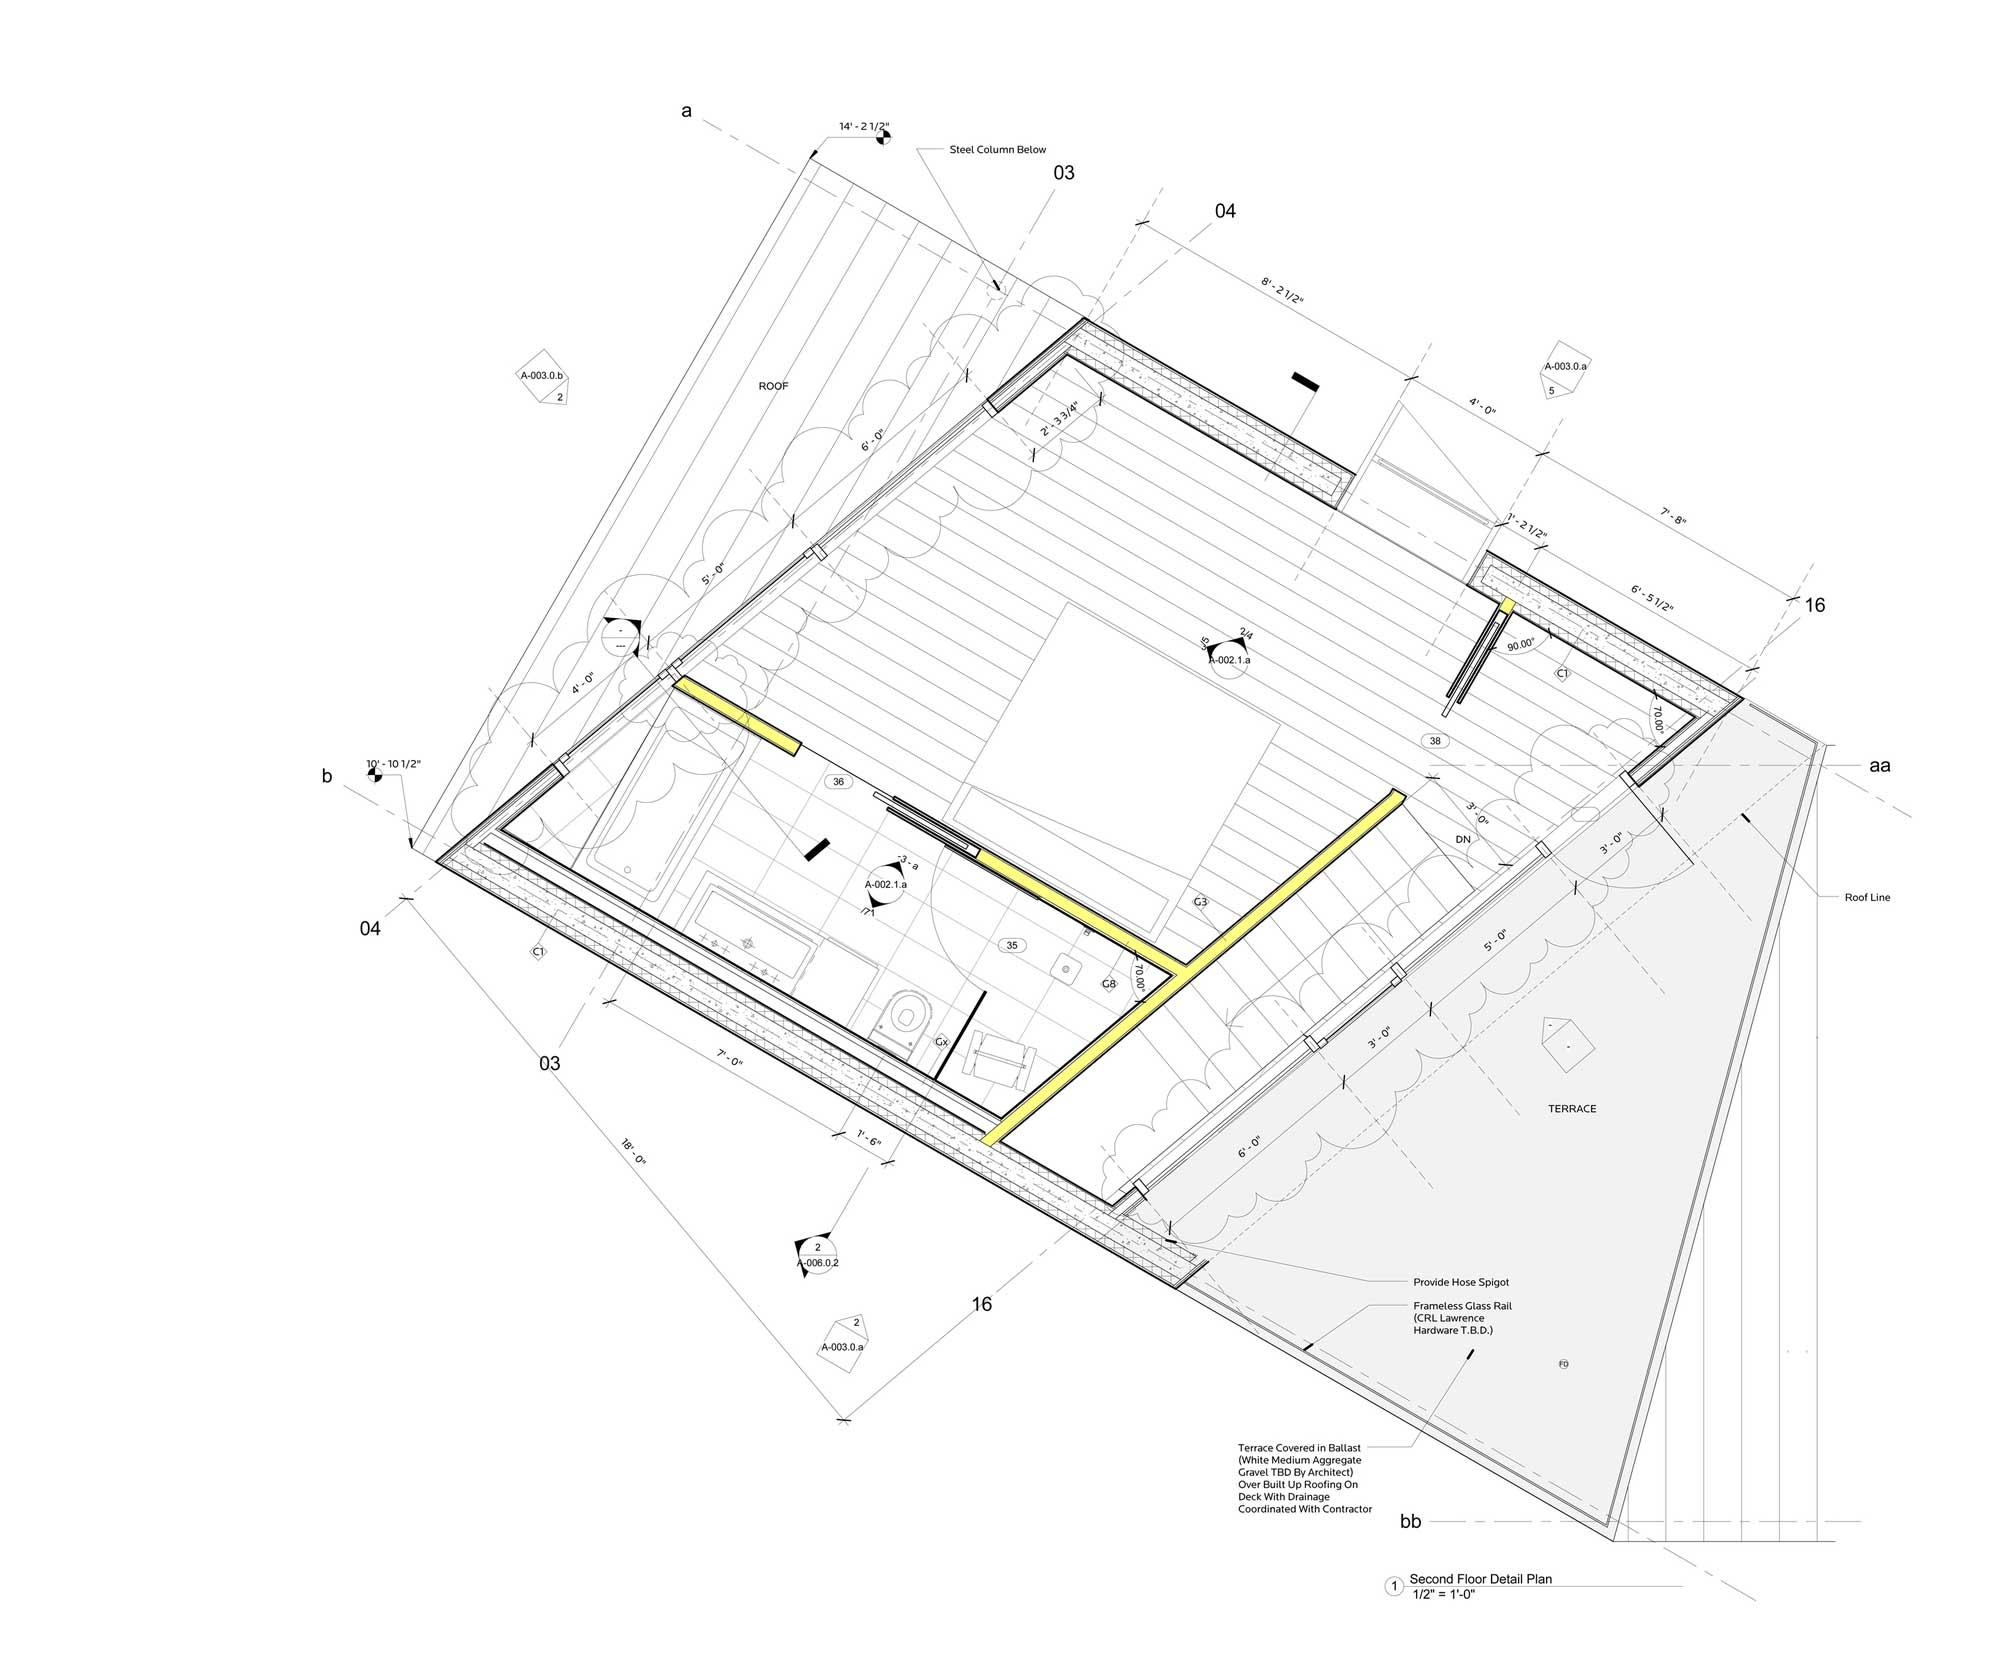 Second Floor Plan, Dutchess House No. 1, New York by Grzywinski+Pons